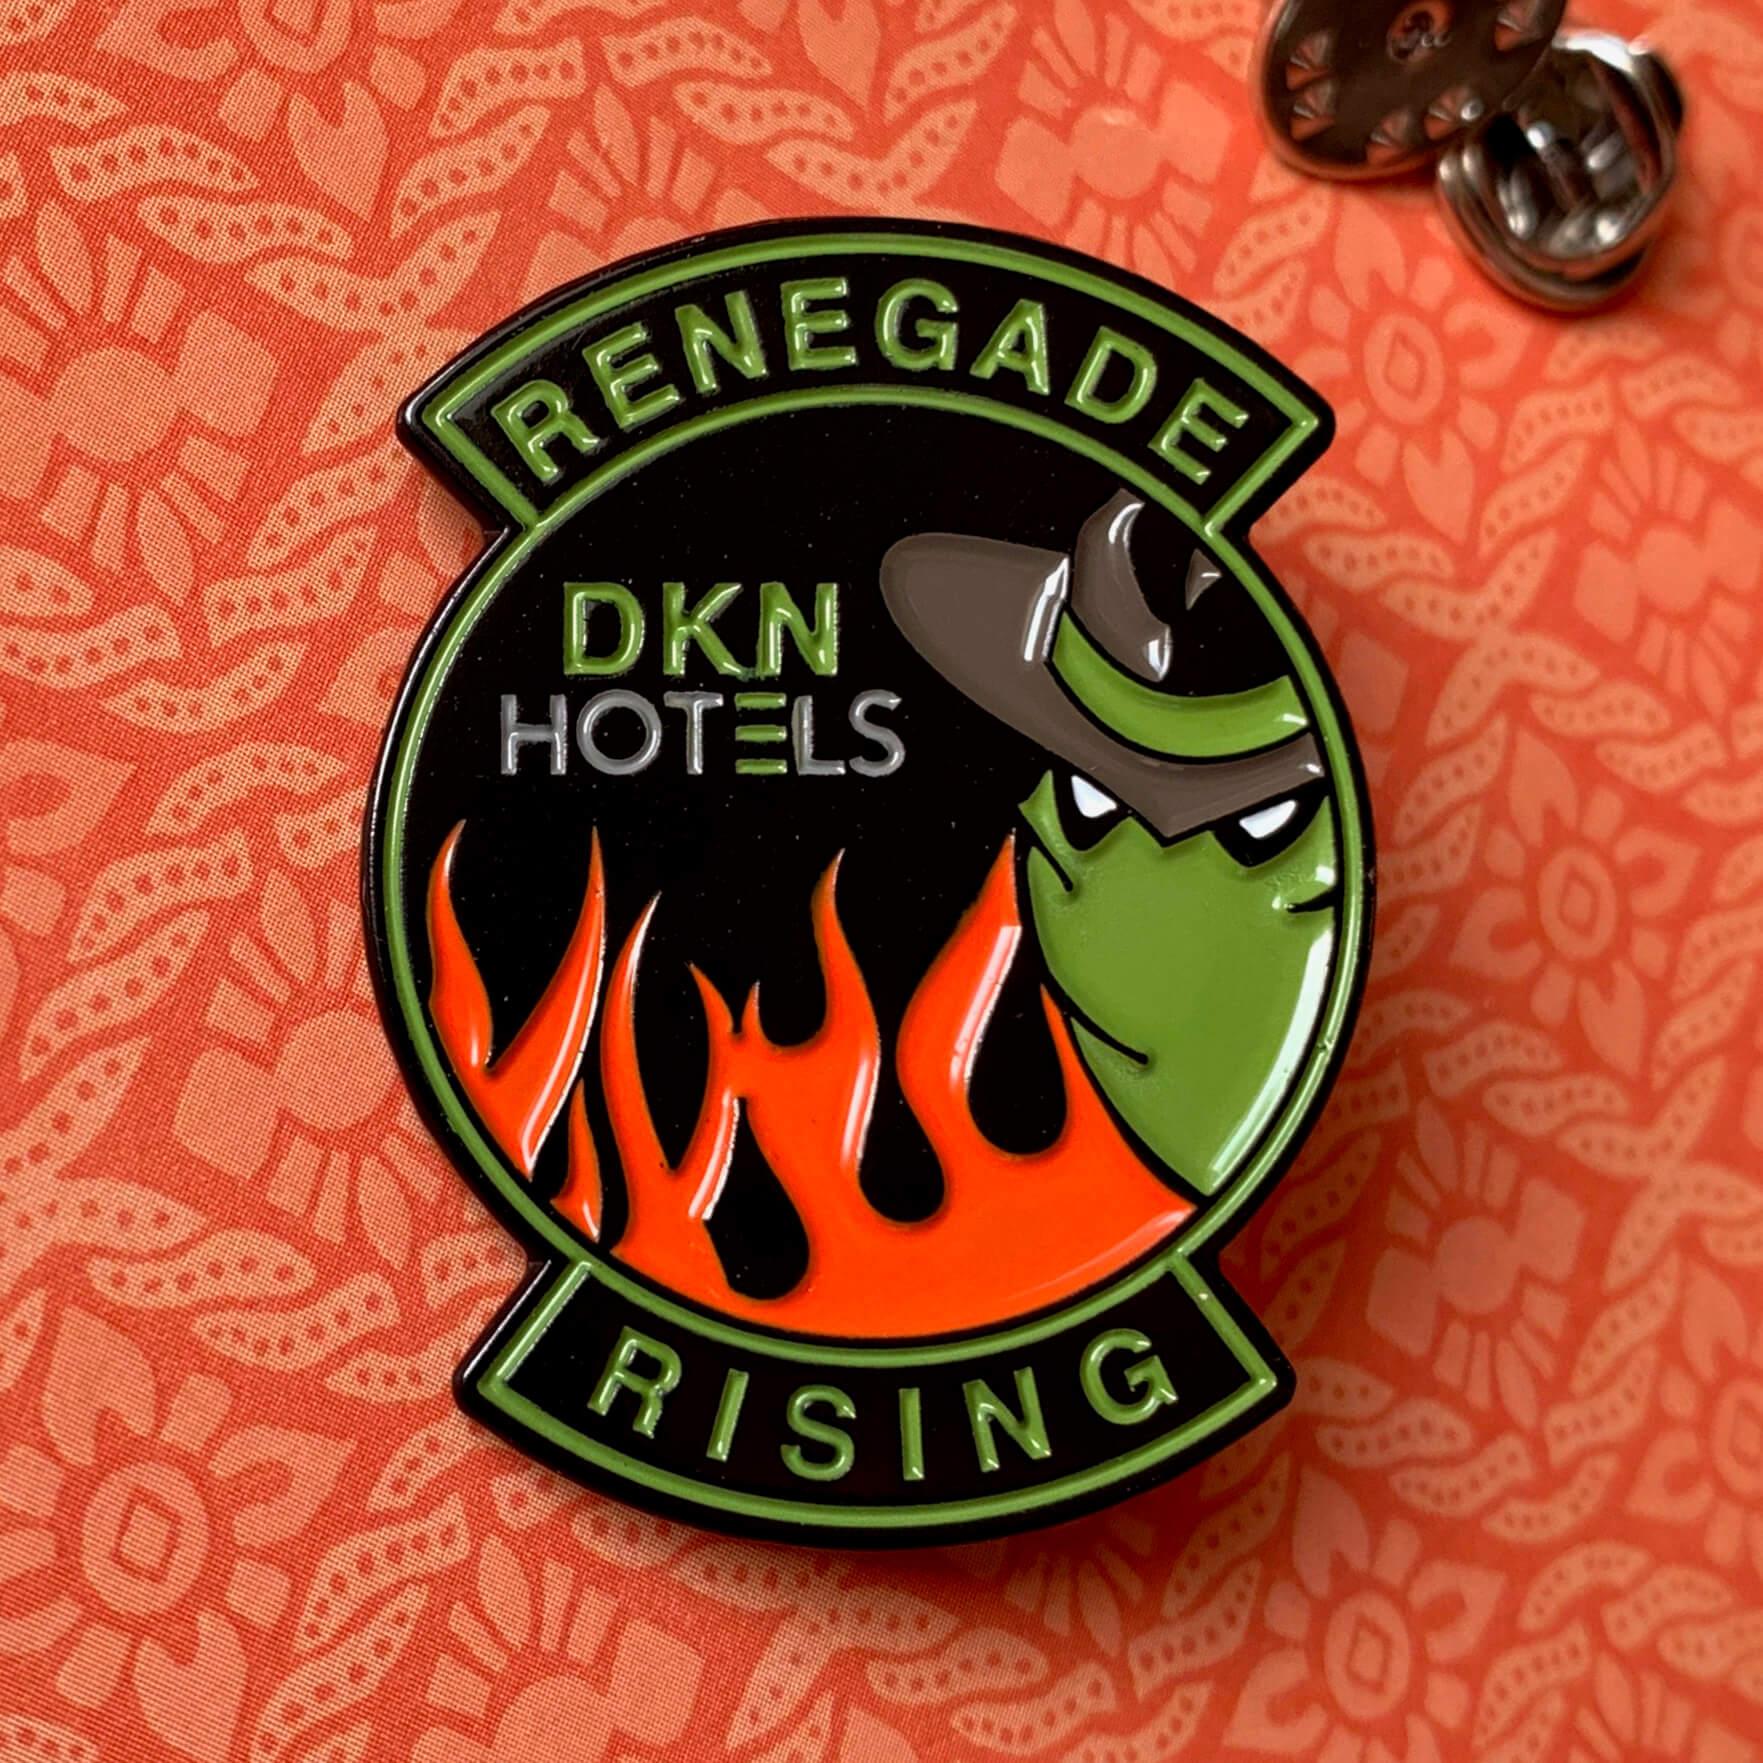 Renegade rising